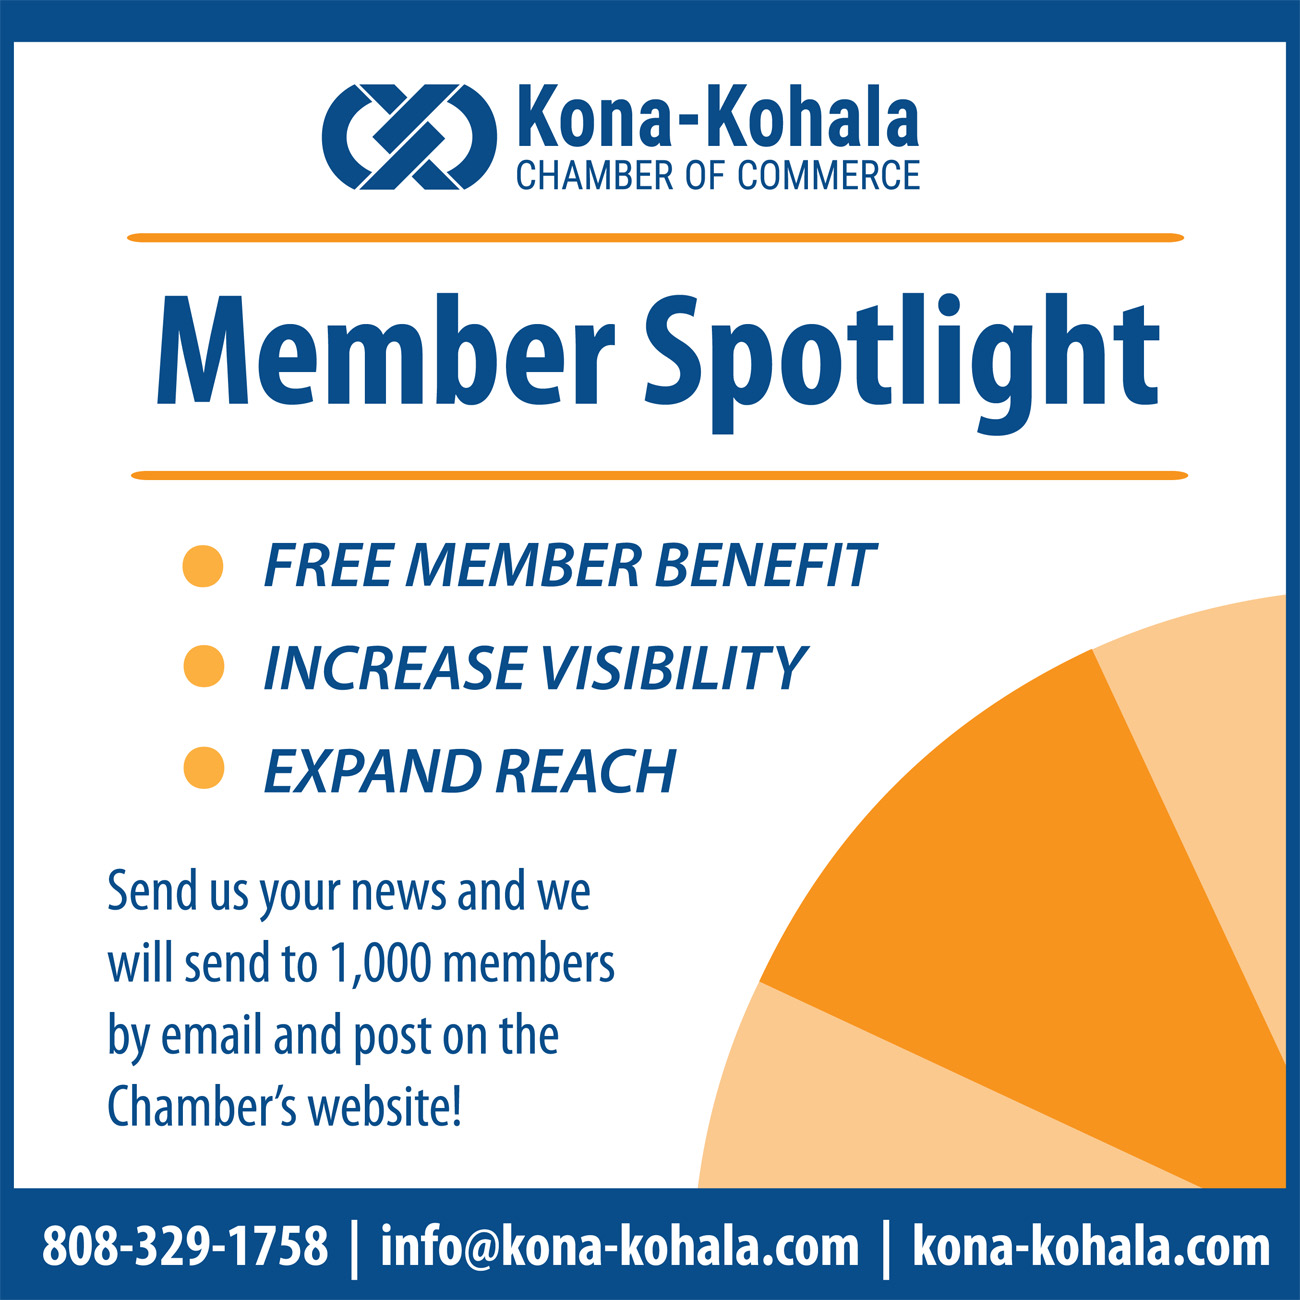 Member-Spotlight-2020-w1920.png